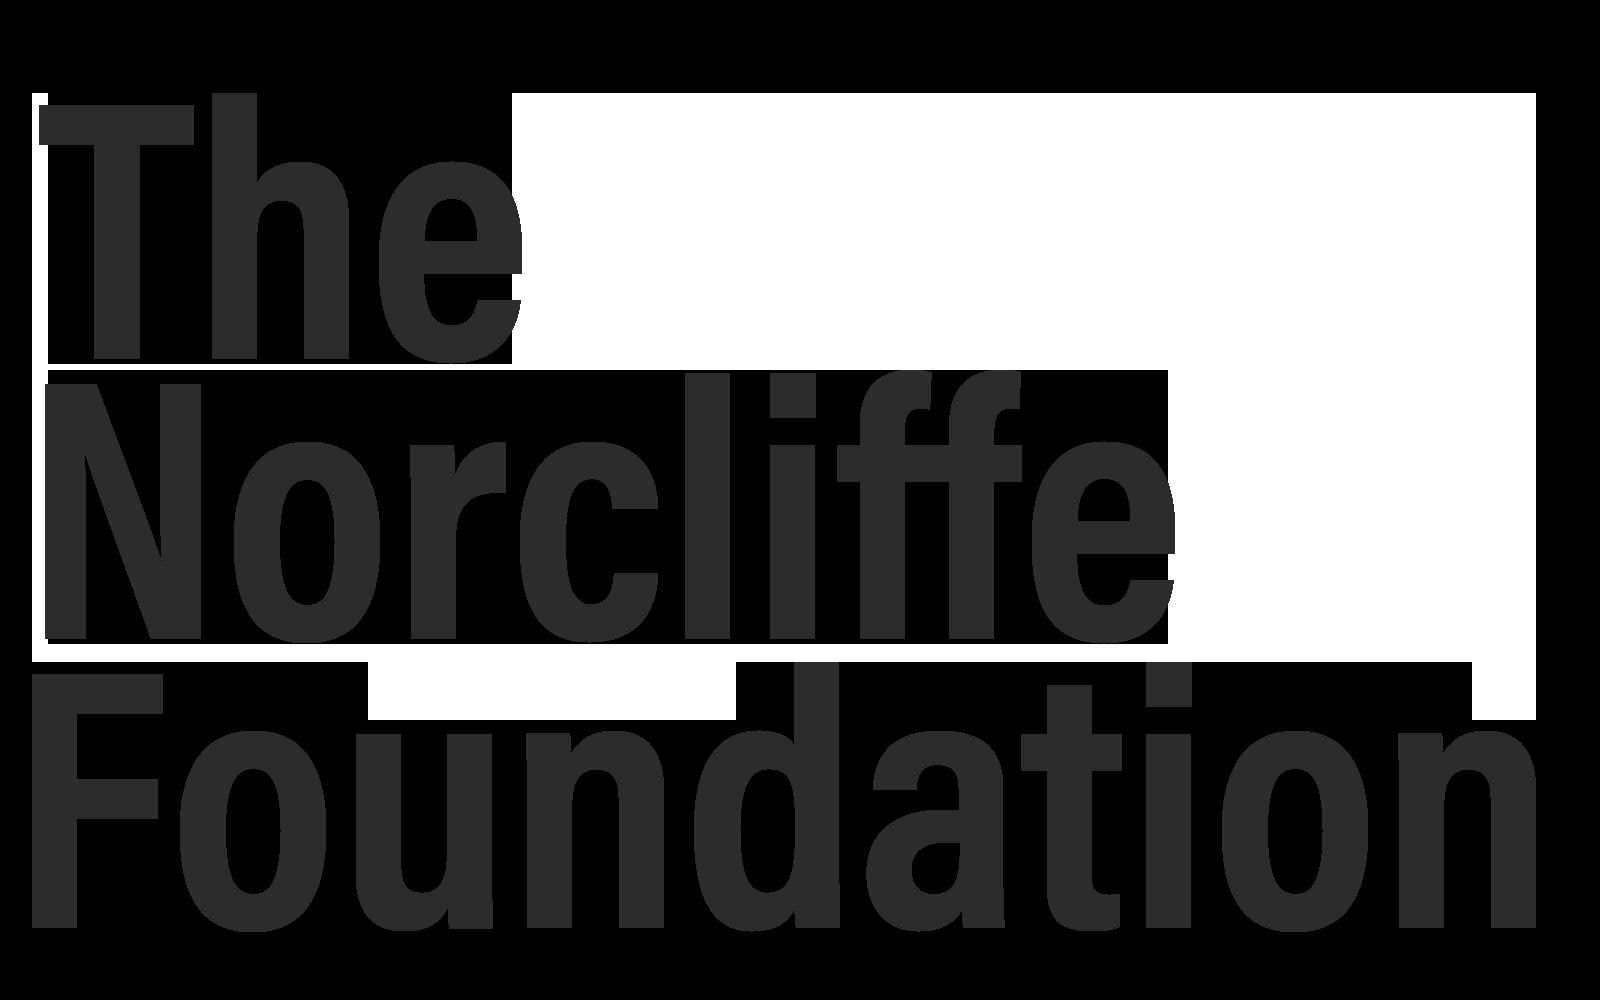 Norcliffe-logo-v2